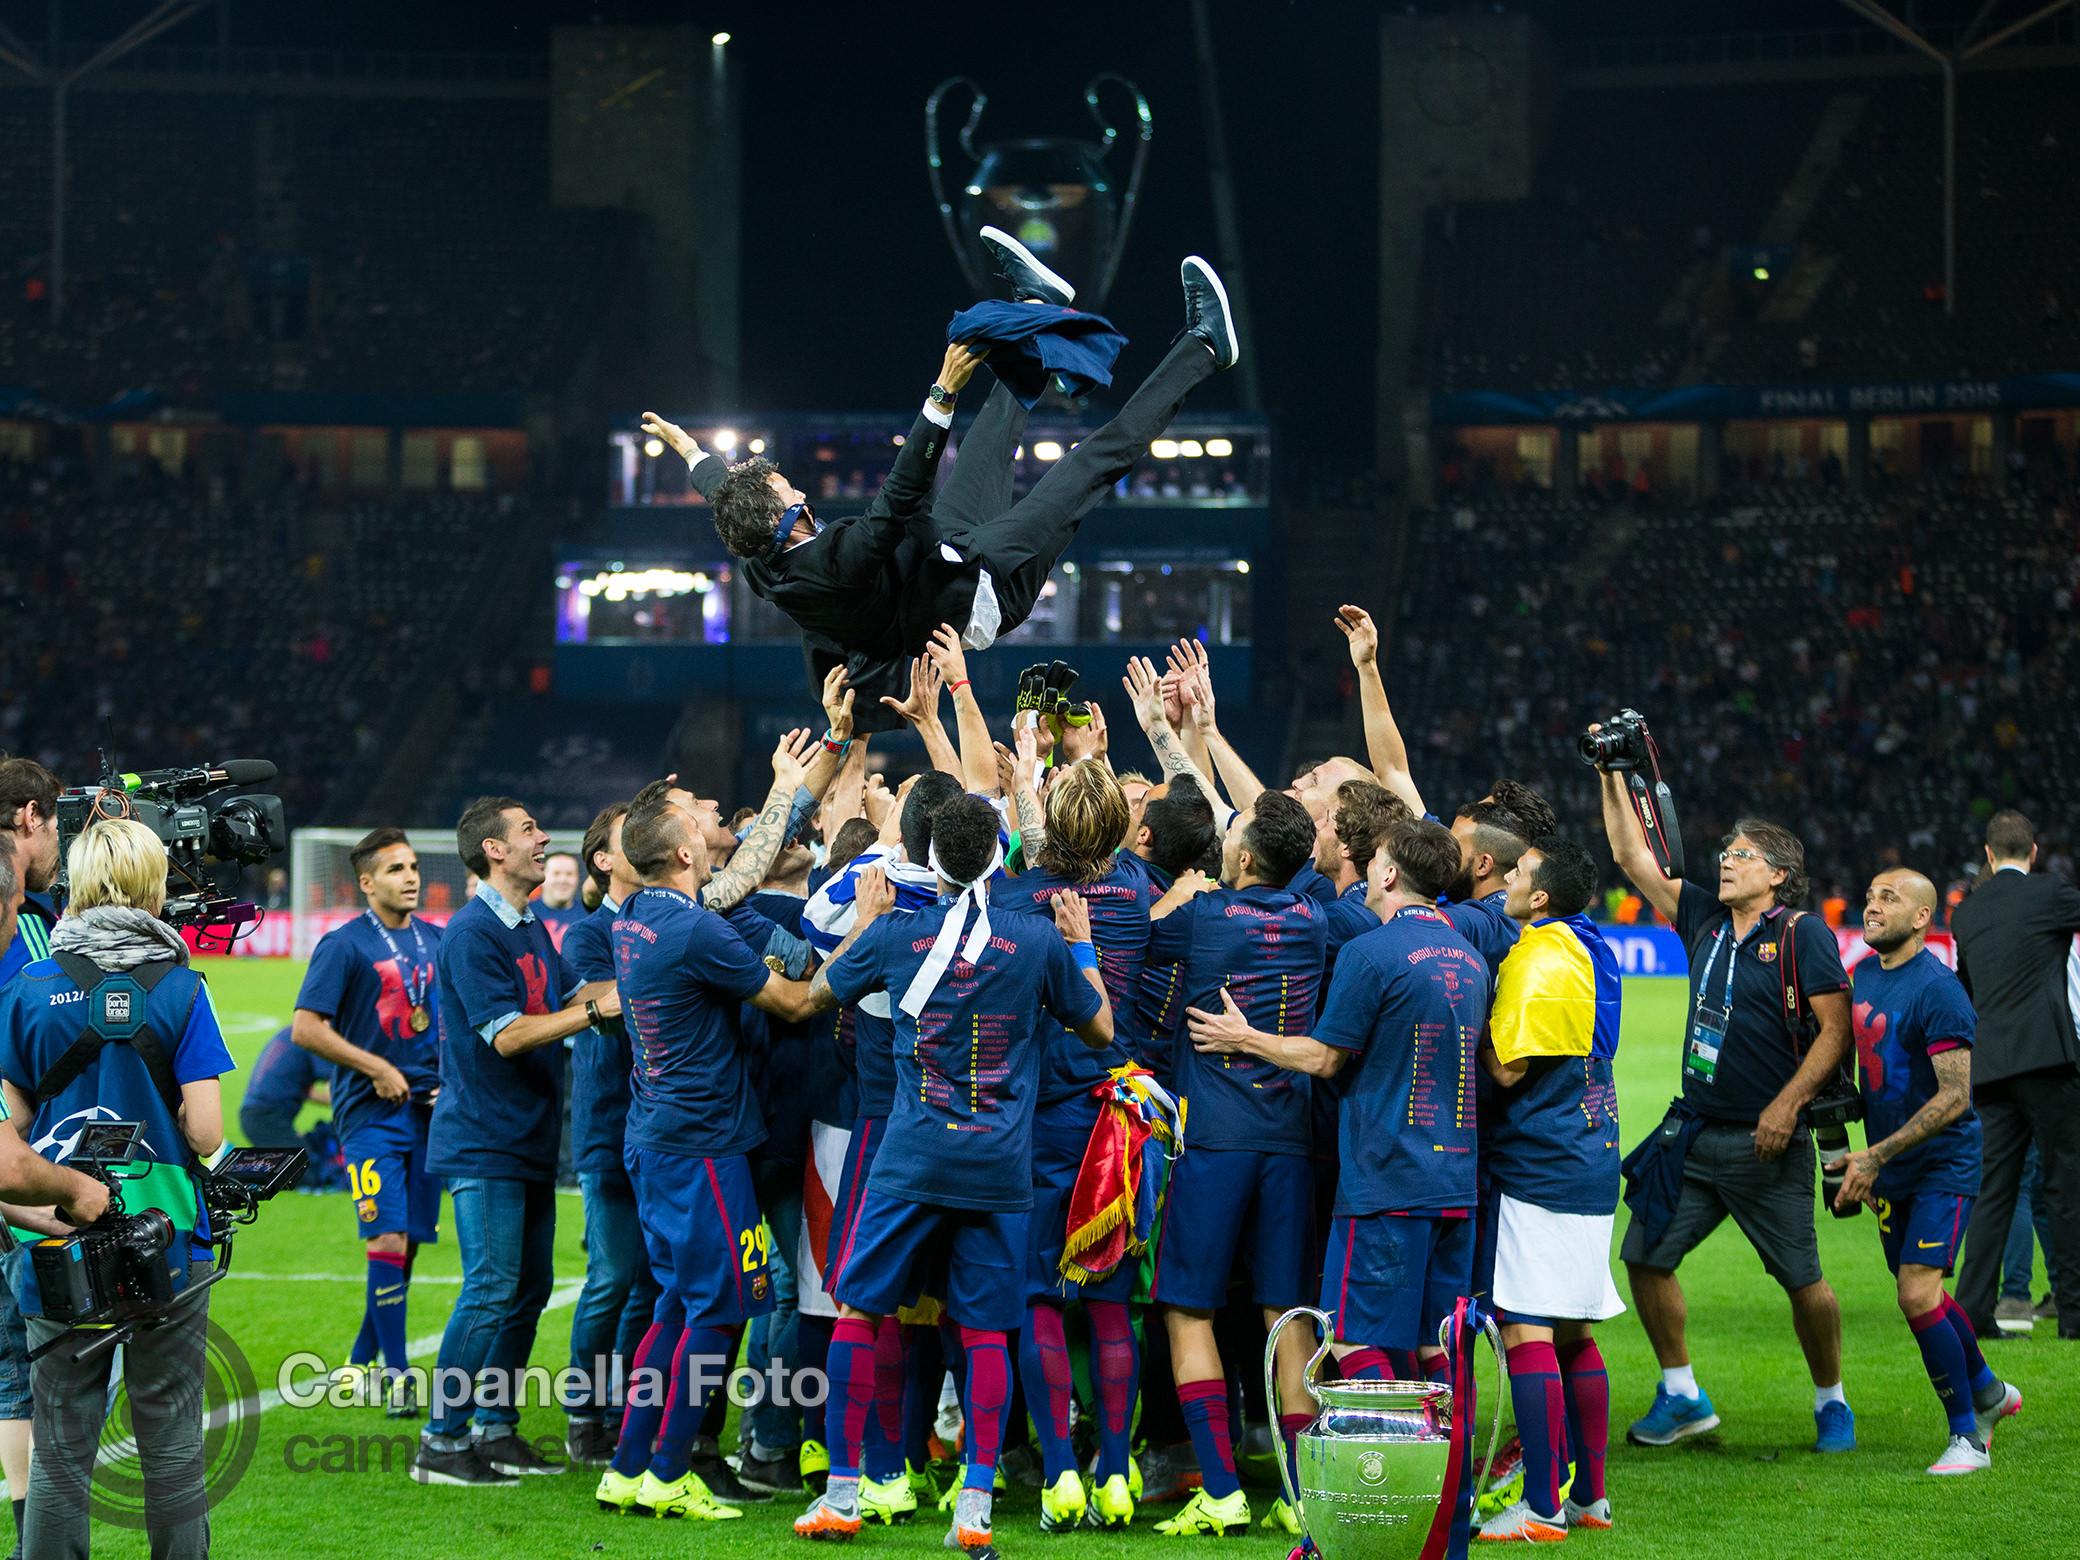 Champions League Final (Part. 2) - Michael Campanella Photography